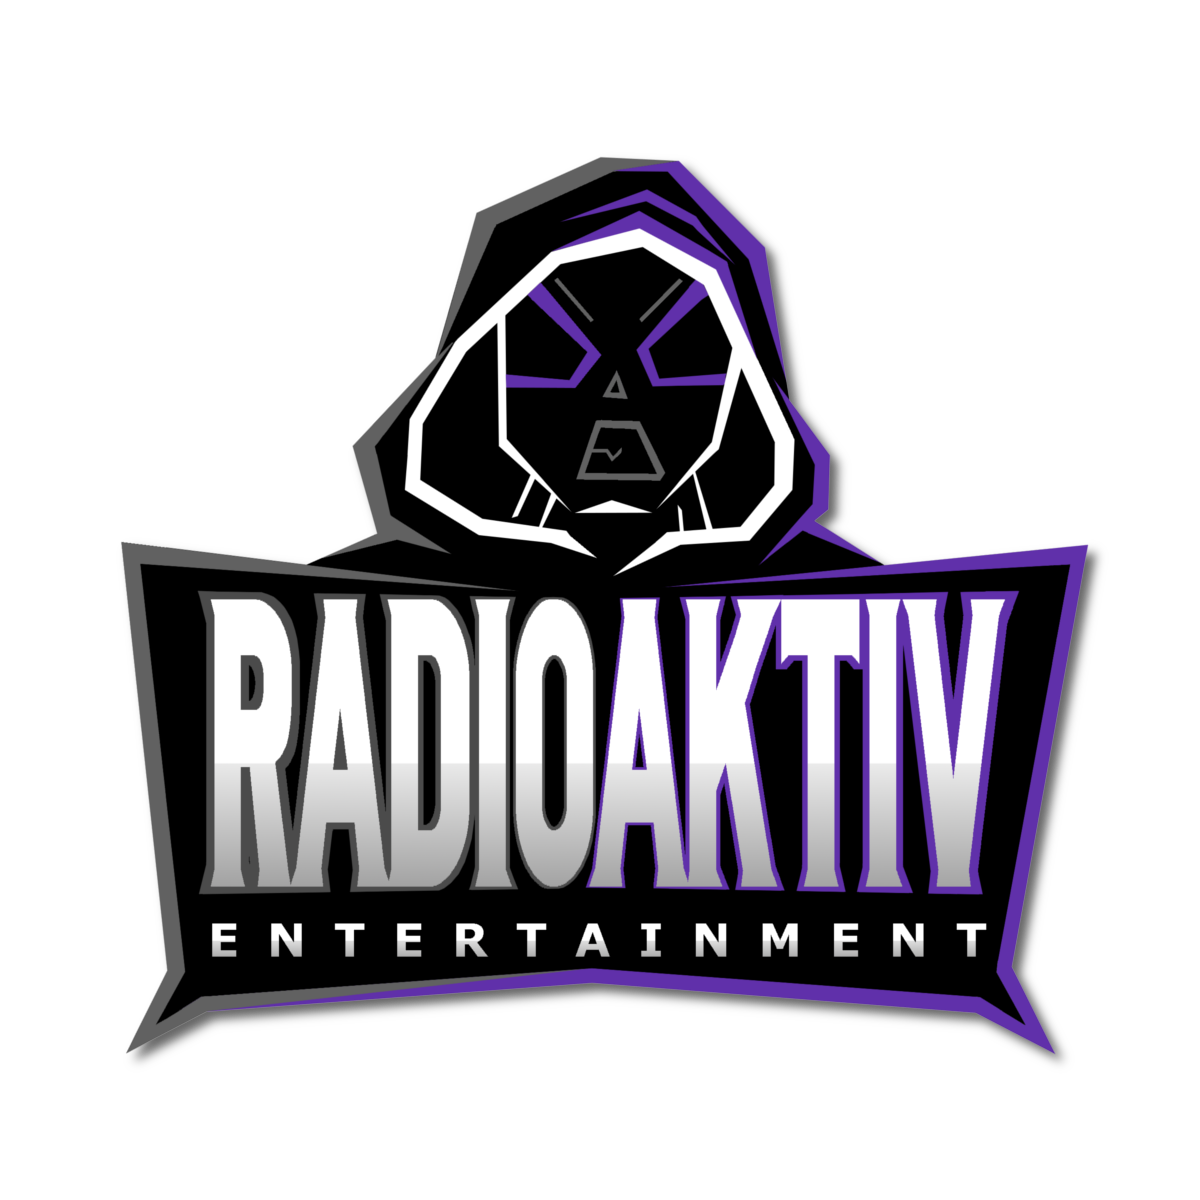 Logo Radioaktiv Entertainment - Deutsche Gaming Community